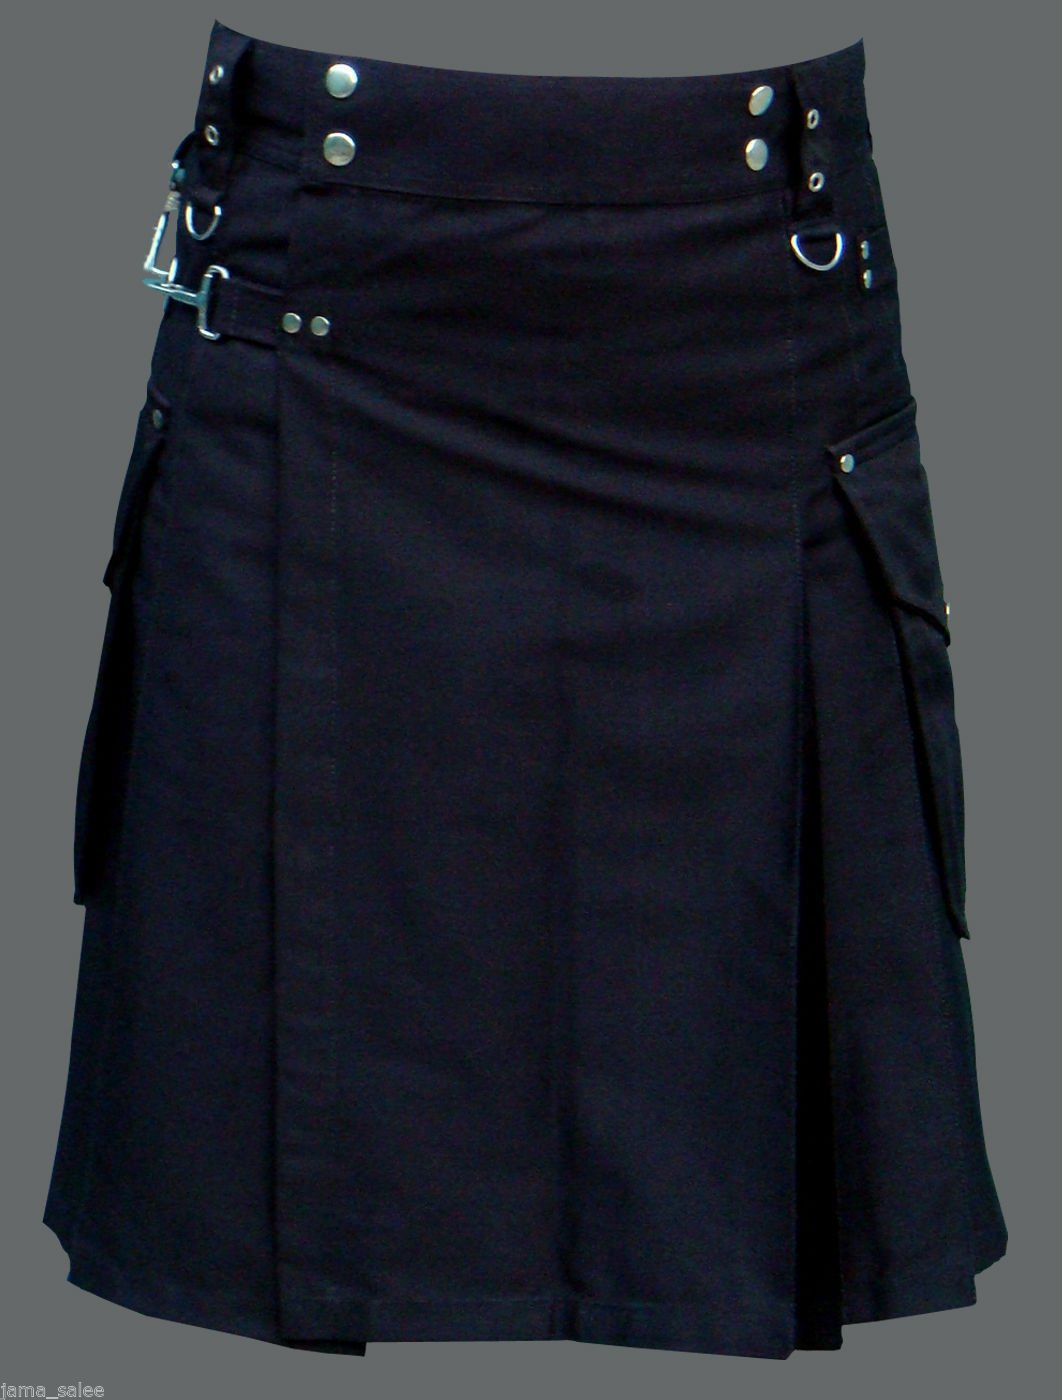 Deluxe Black Cotton Kilt Handmade Utility Gothic Modern Kilt with Cargo Pockets Waist Size 30 to Fit